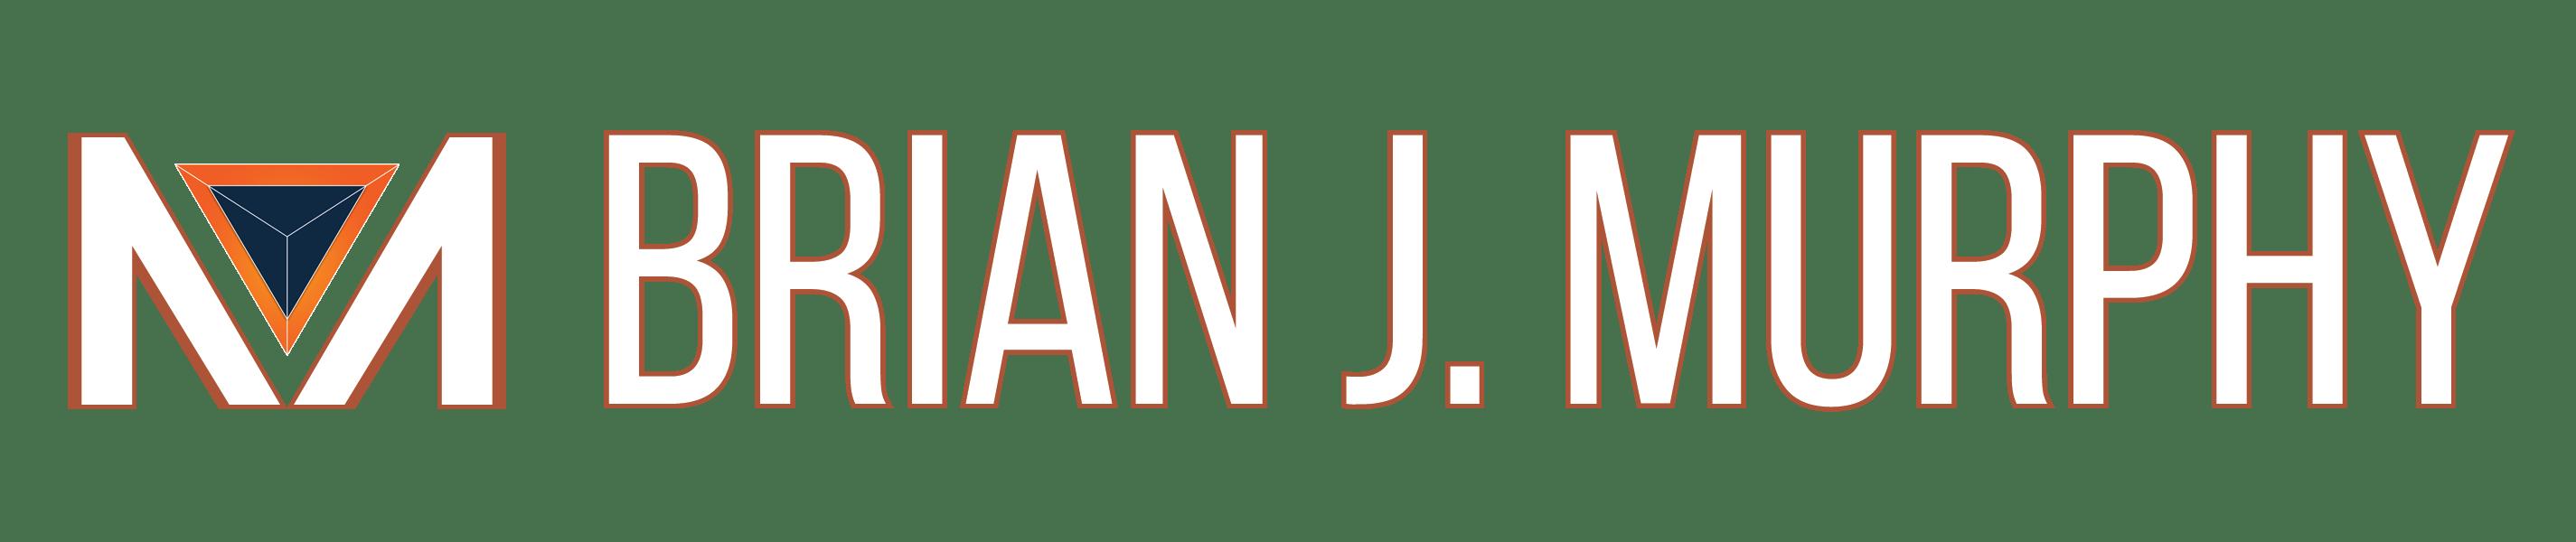 Brian J Murphy Horizontal Logo